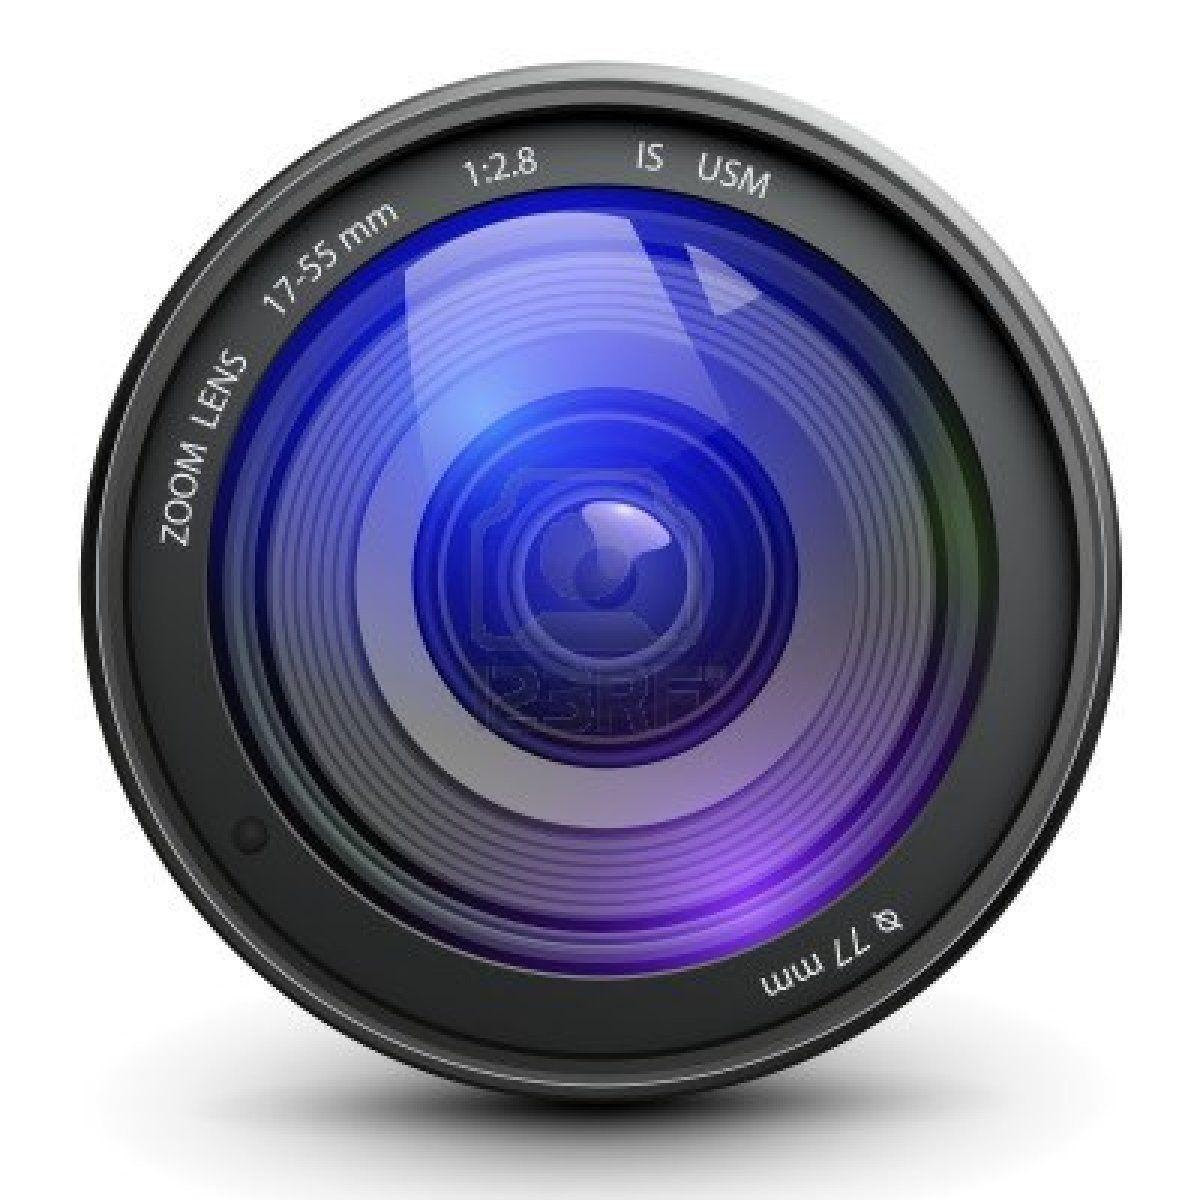 Camera photo lens, vector. Stock Photo 11881342